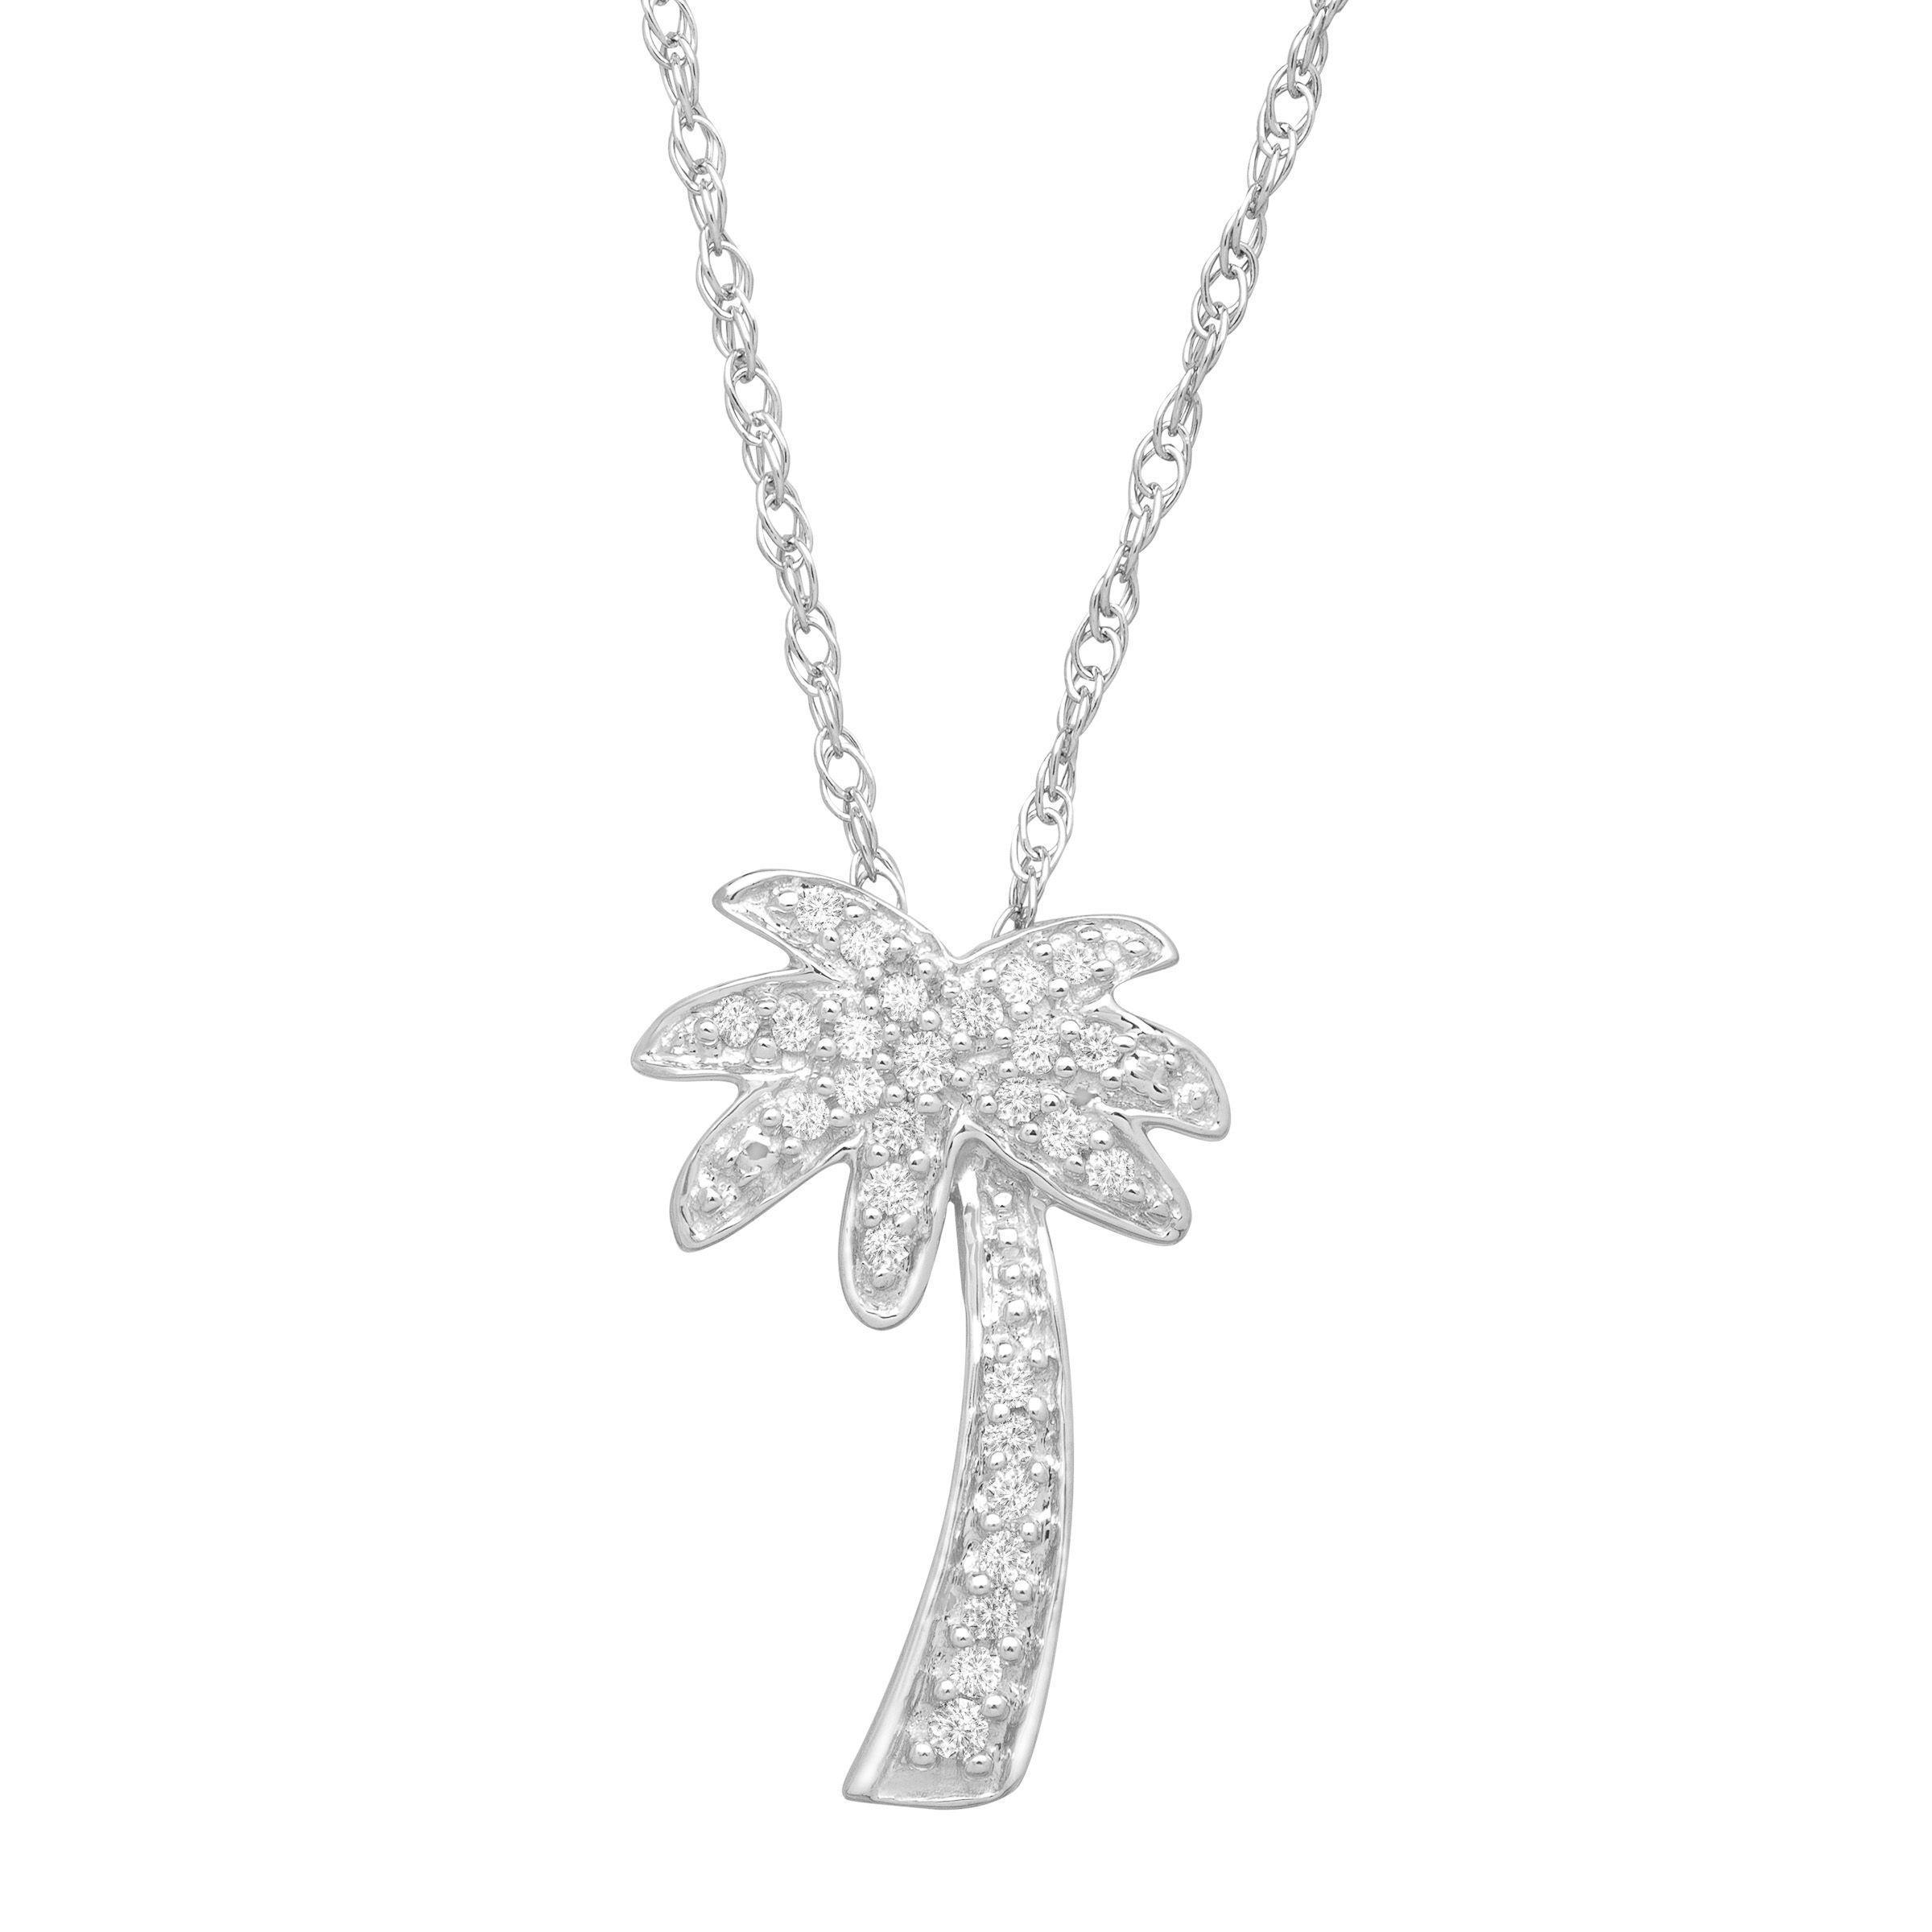 Diamond palm tree pendant 10k w gold 110 cttw j k color i2 i3 diamond palm tree pendant in 10k white gold 110 cttw j k color i2 i3 clarity 18 mozeypictures Gallery